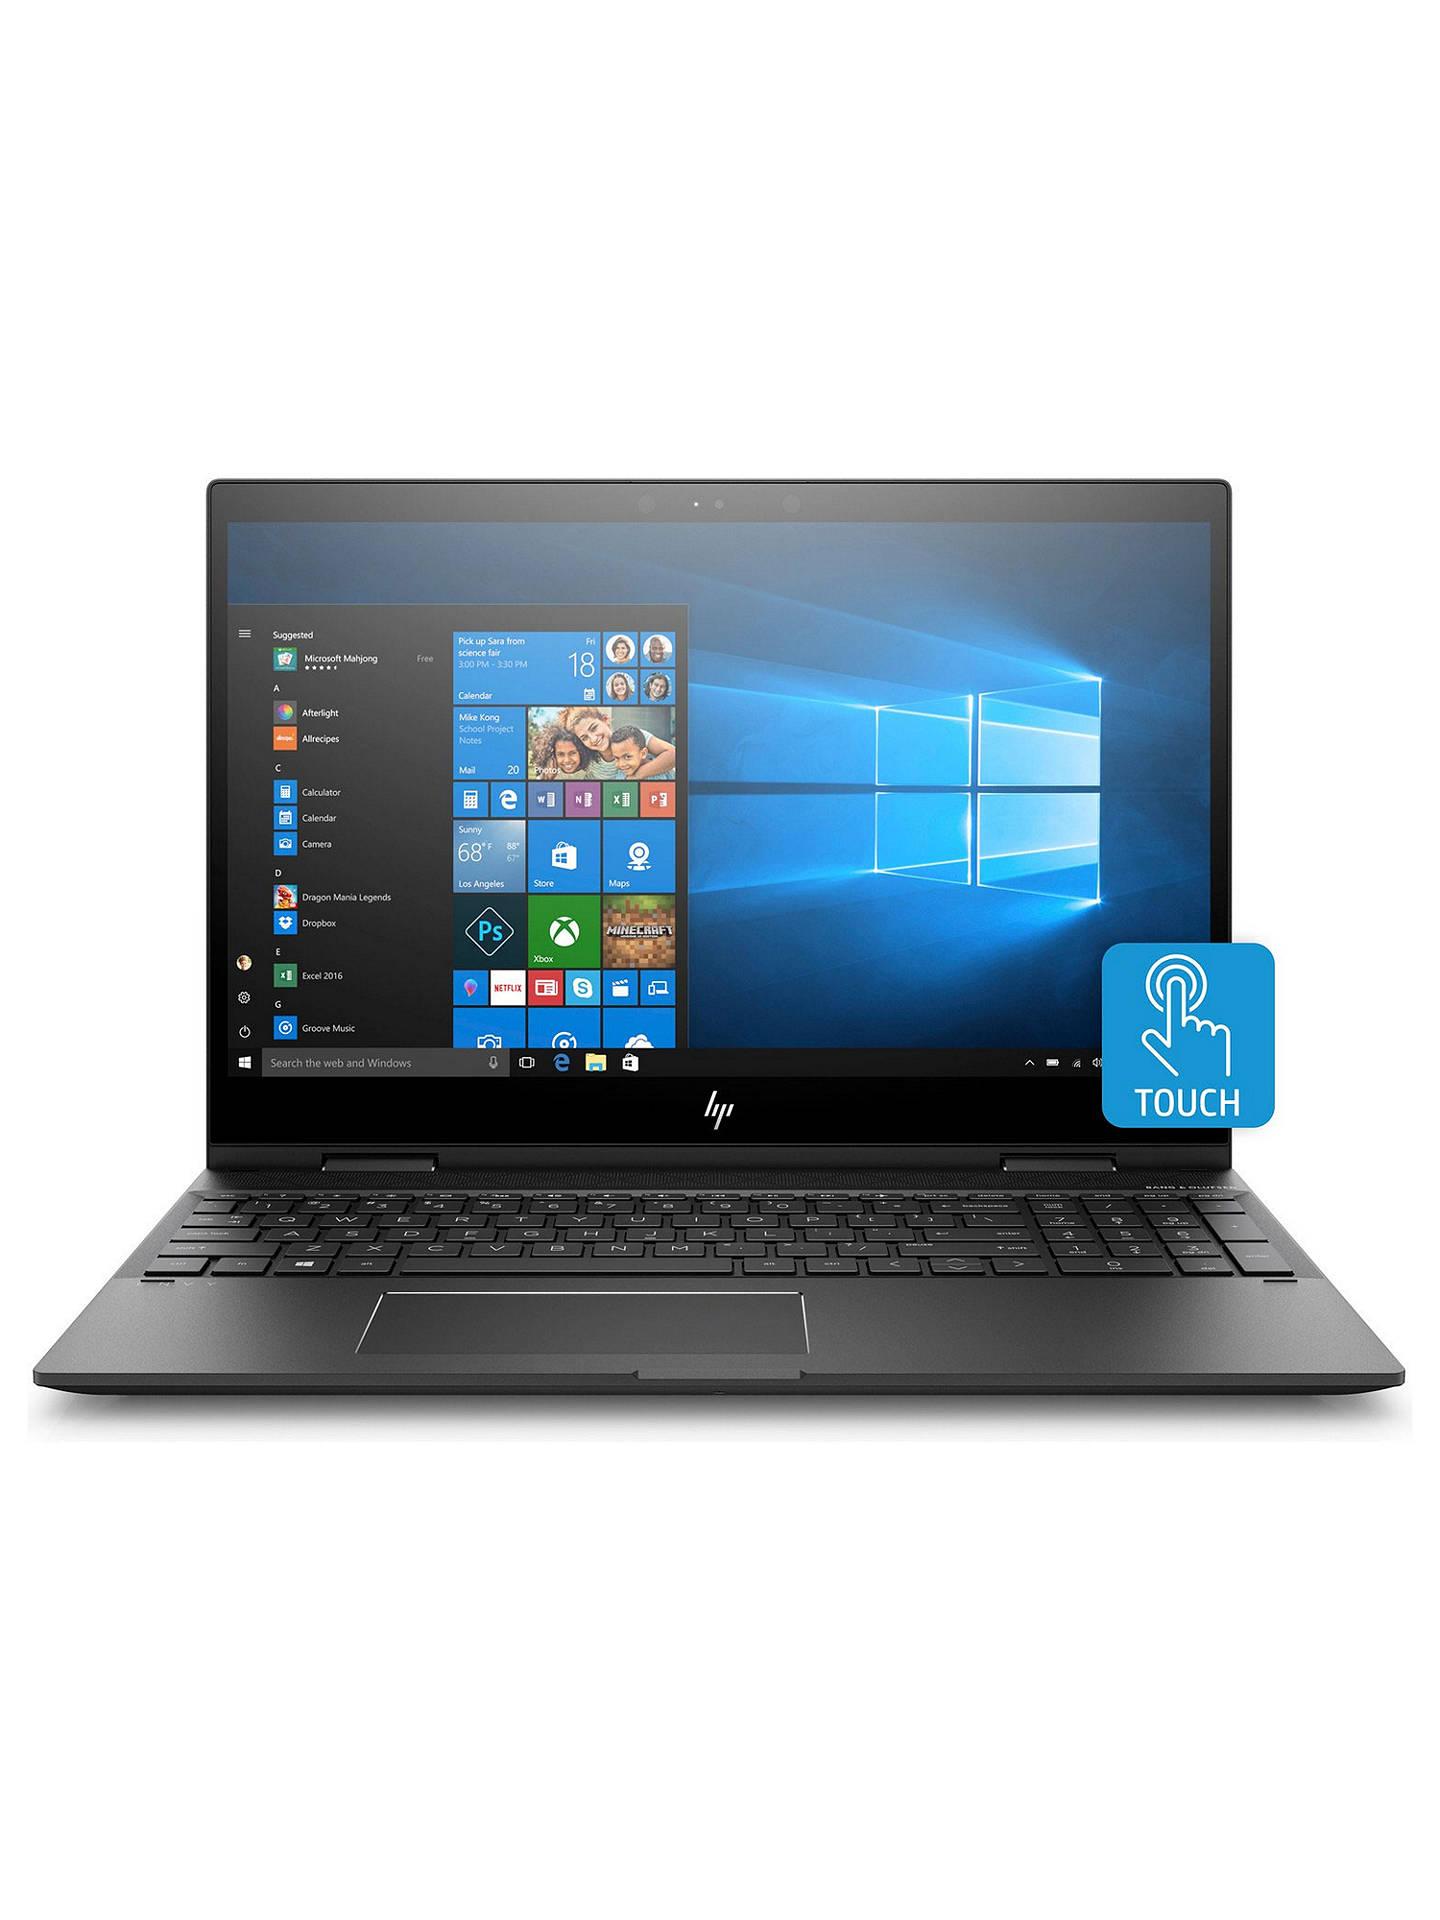 HP ENVY x360 15-cp0001na Convertible Laptop, AMD Ryzen 7